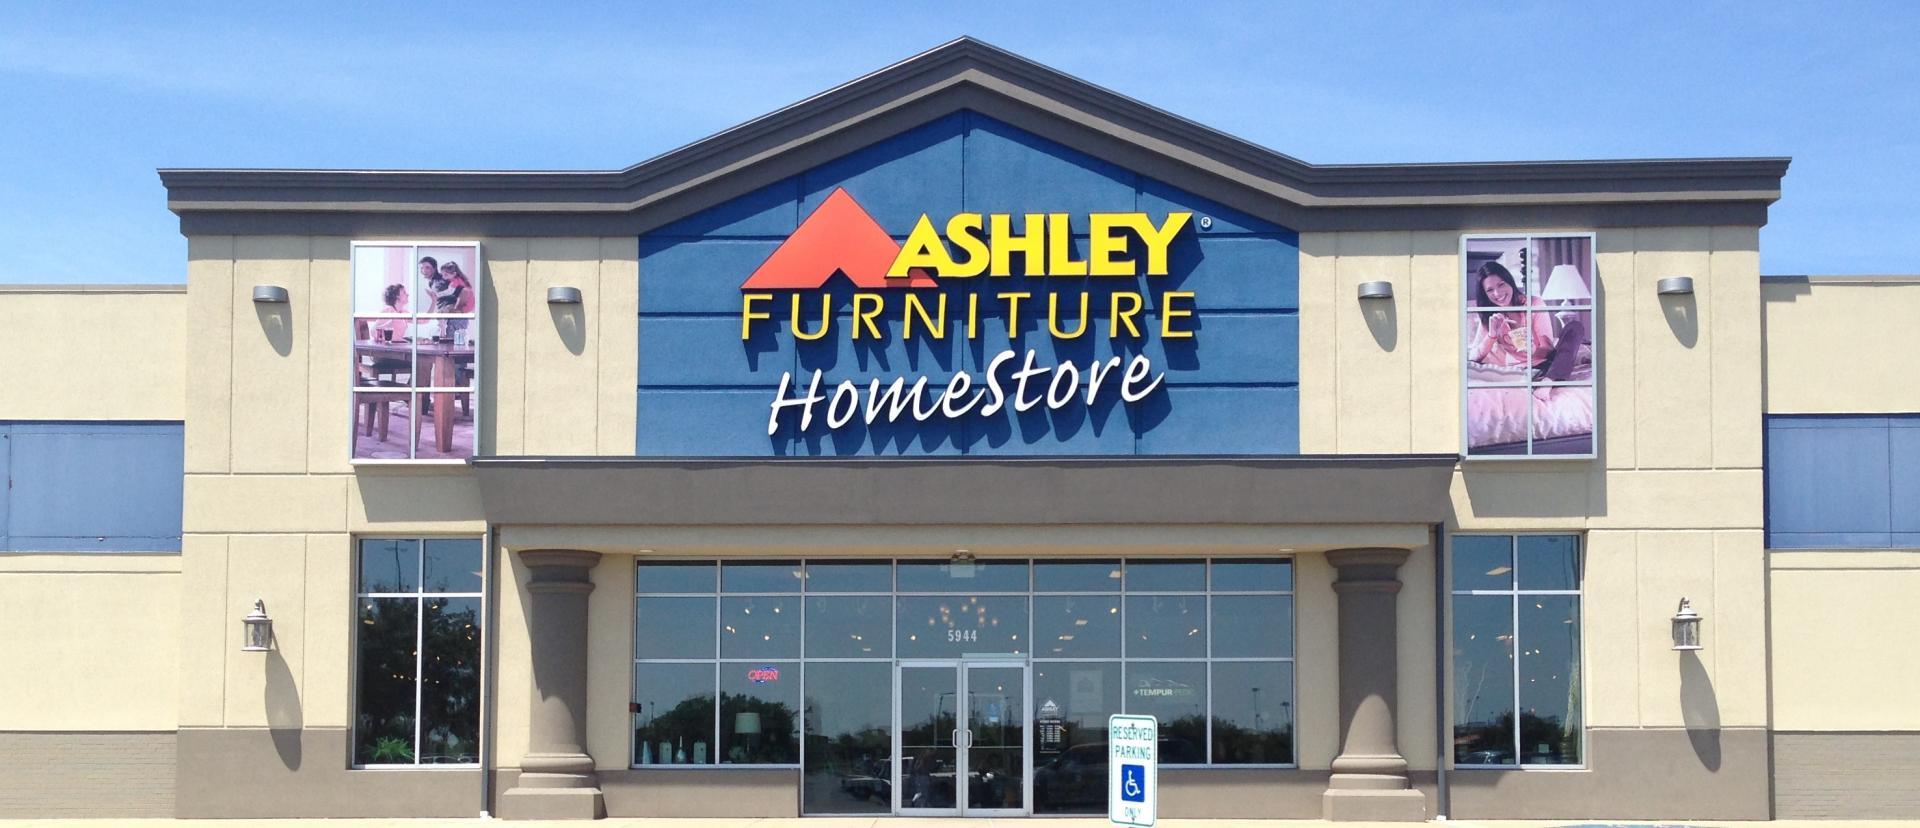 Job fair to help displaced Ashley s Furniture workers find employment  Job  fair to help. Ashleyfurniturestore com   Descargas Mundiales com